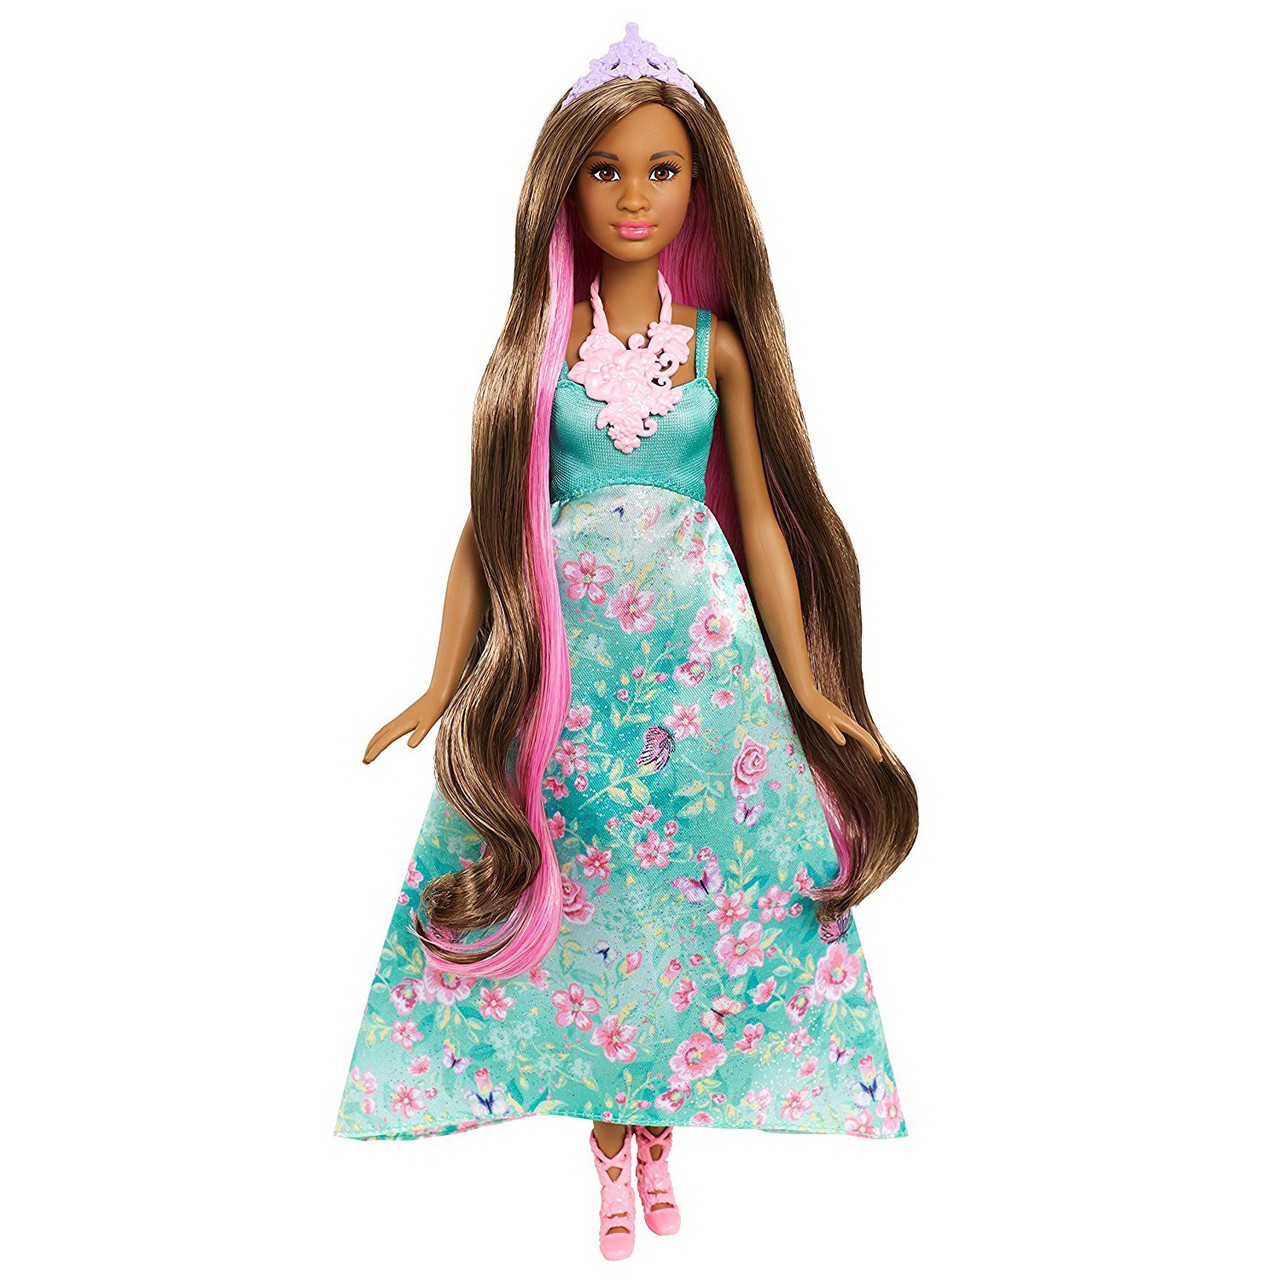 "Barbie ""Дримтопиа"" Принцесса с волшебными волосами, Кукла Барби шатенка"